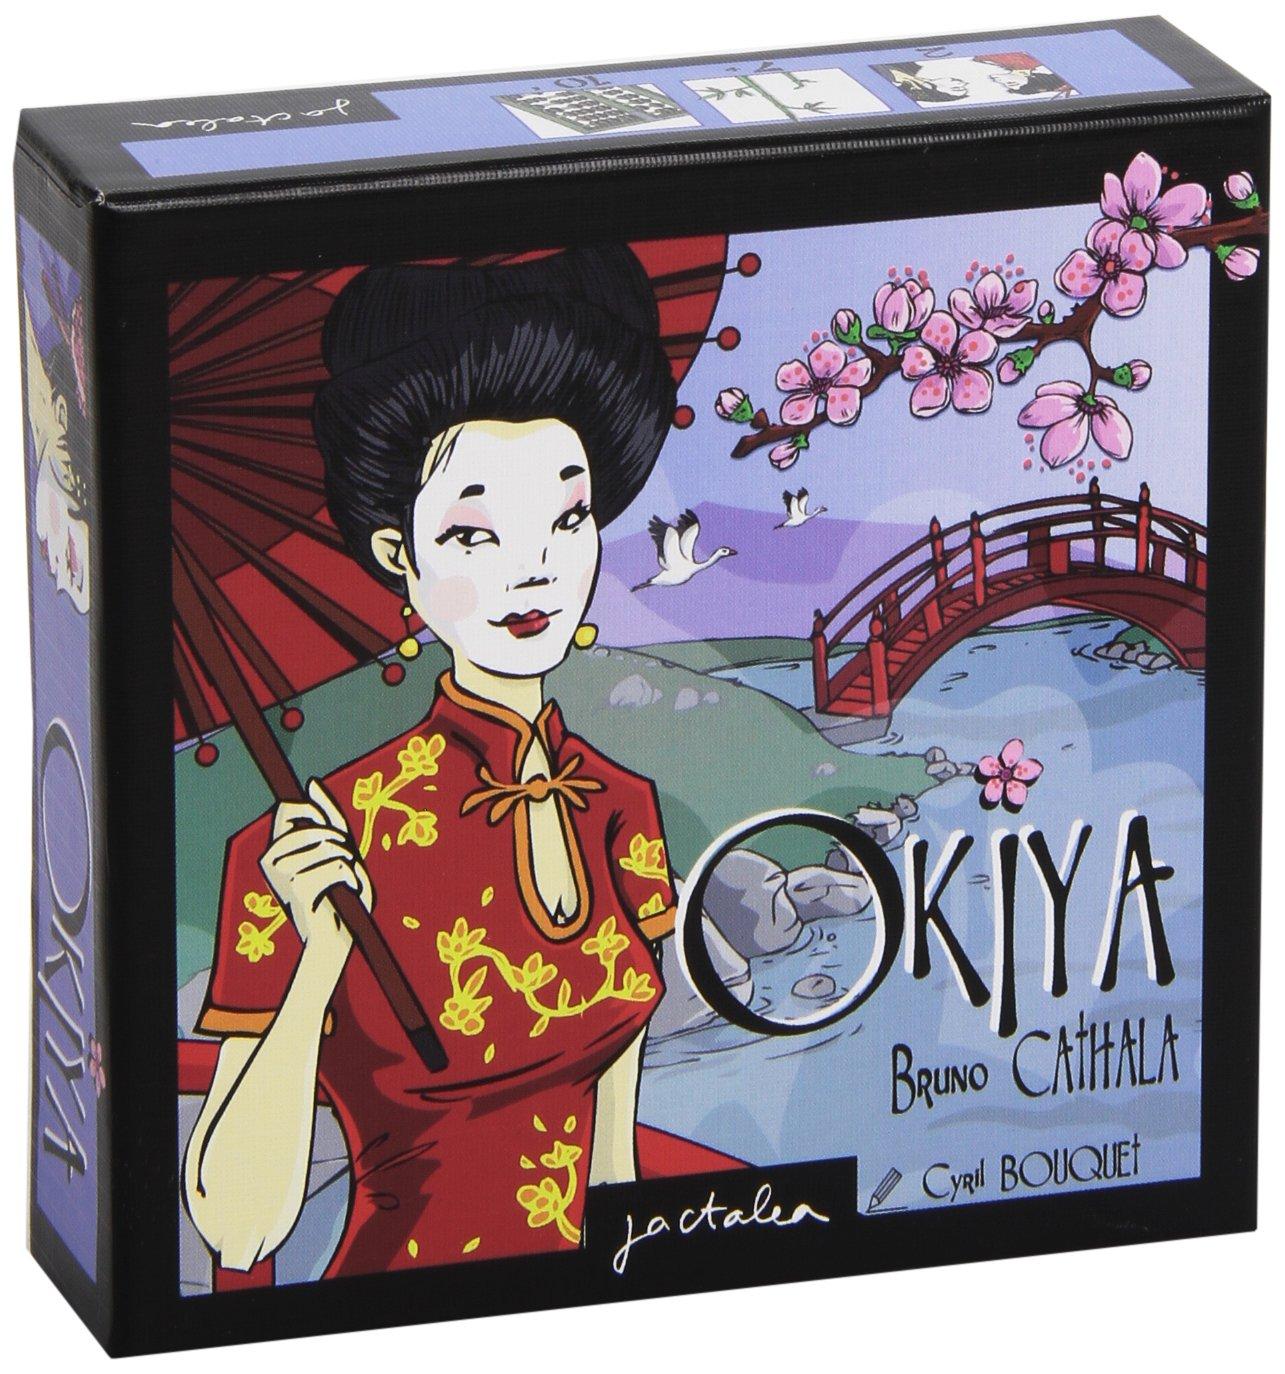 Jactalea - Okiya by Jactalea